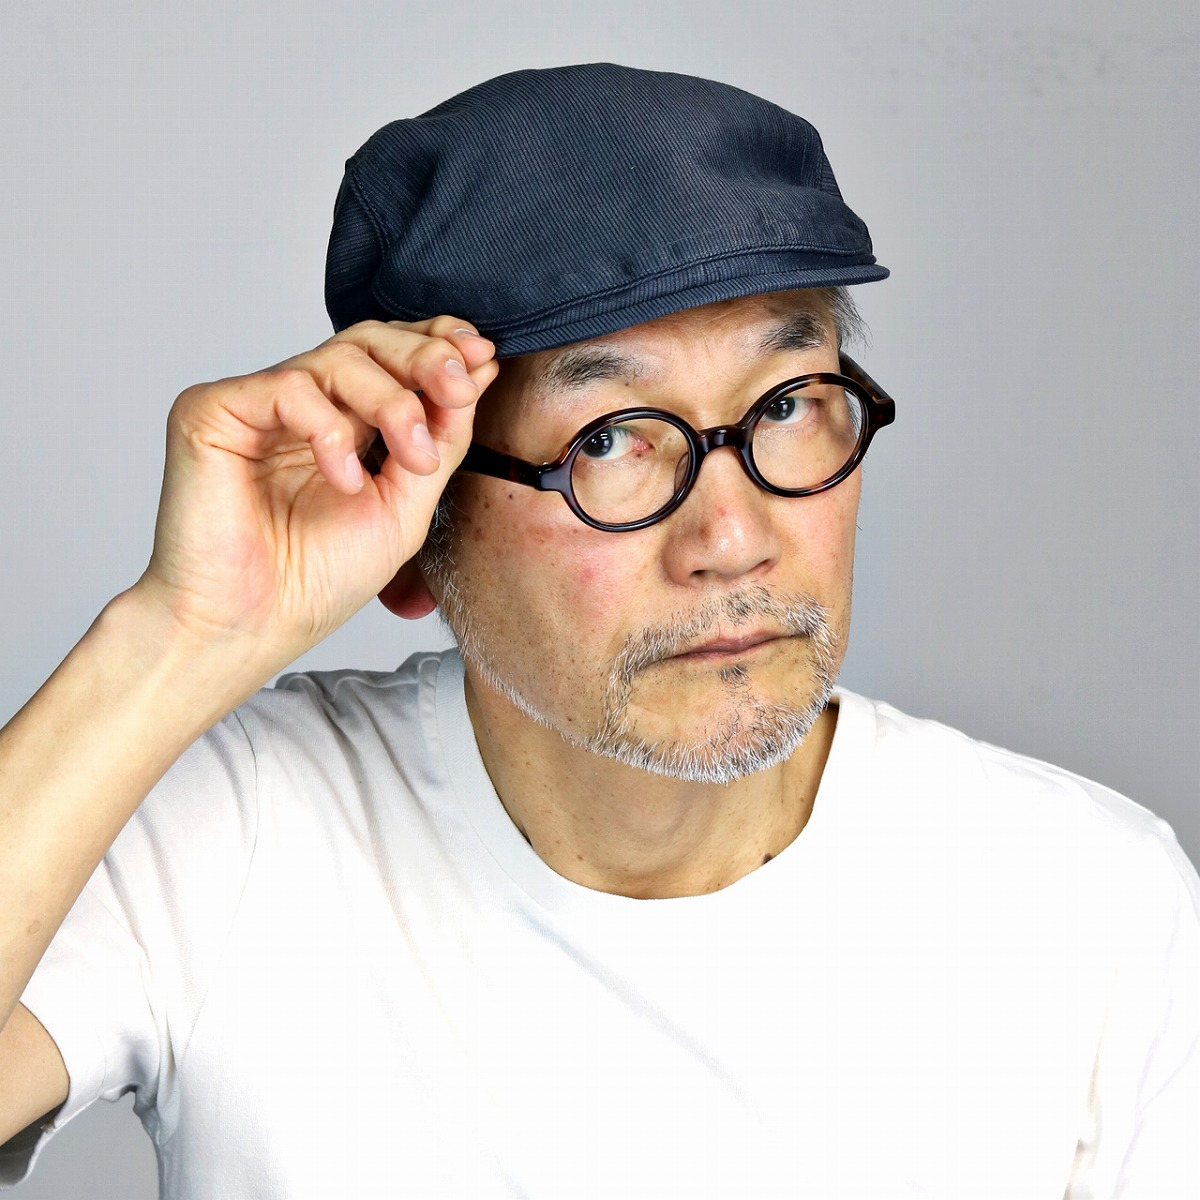 1c23fabe0c6 Size size adjustment hat brand   dark blue navy  ivy cap  where Shin pull  moisture absorption fast-dry Lamy hemp S M L LL hunting cap is big in Mila  Schon ...